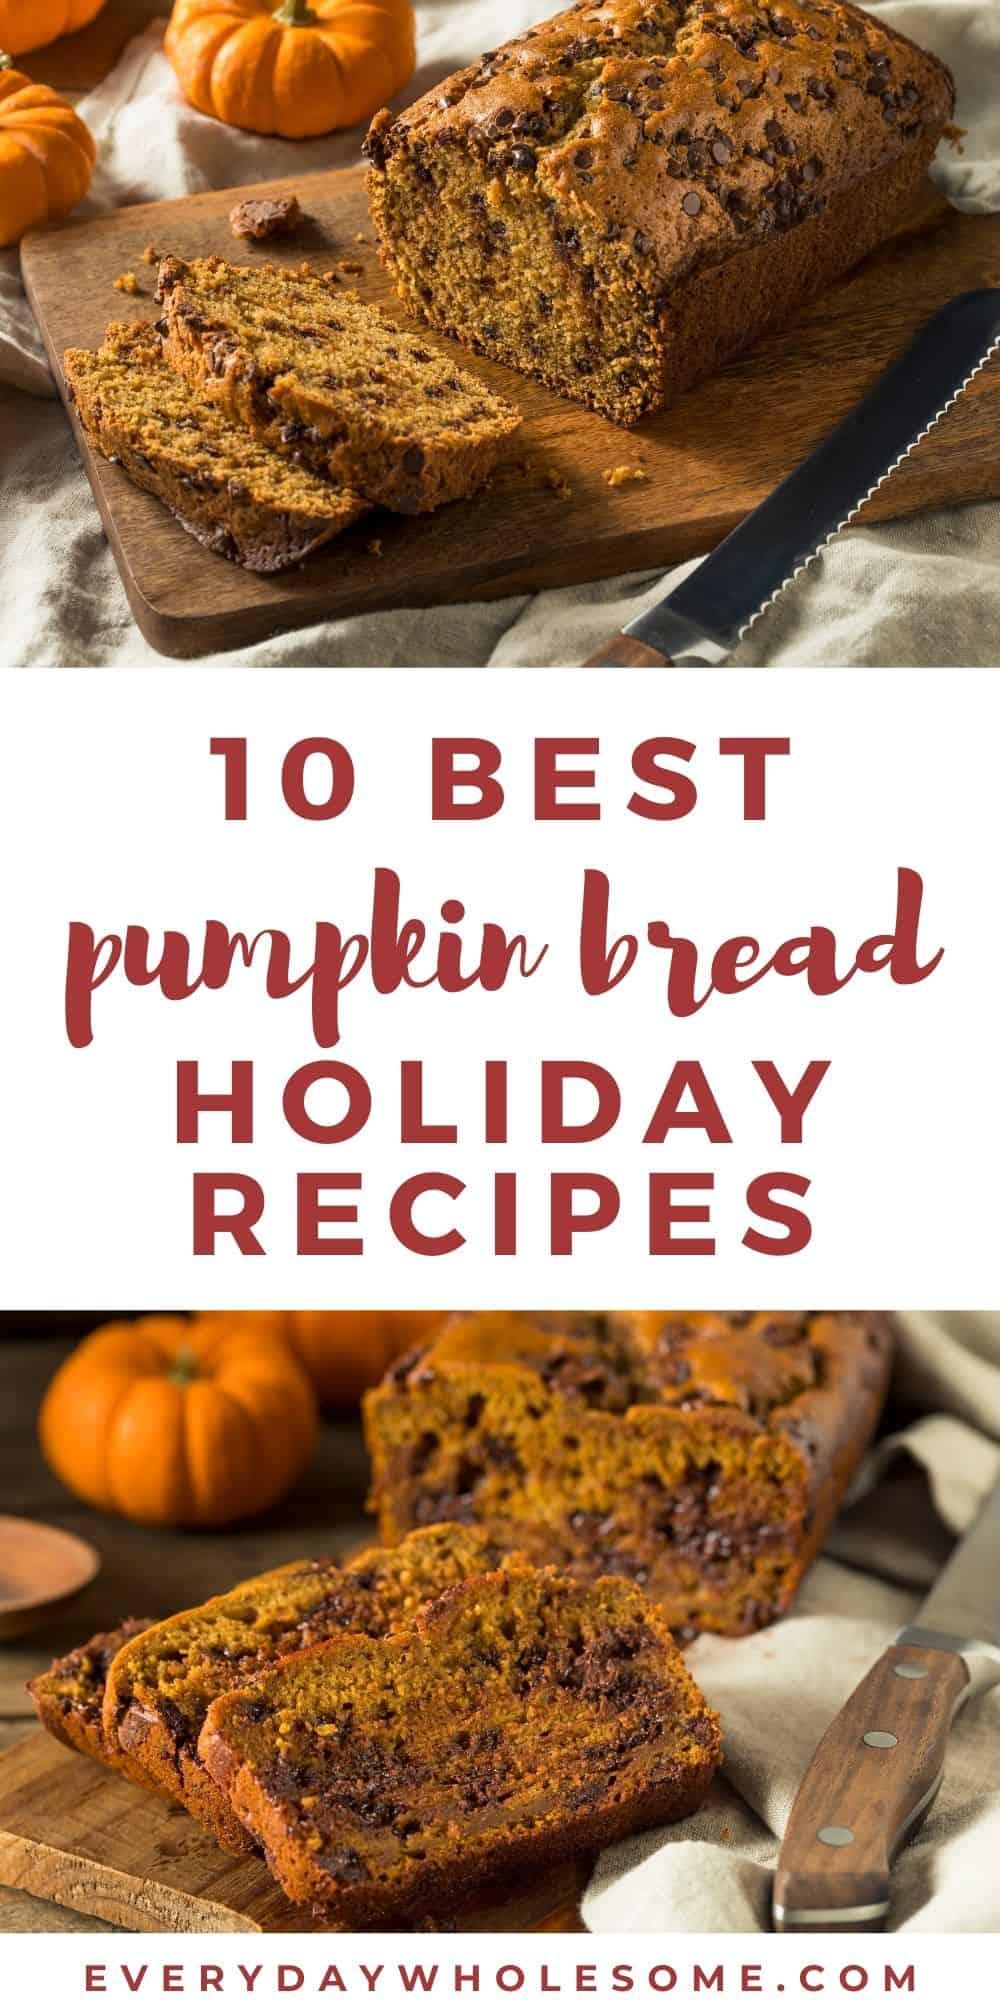 10 best holiday pumpkin bread recipes